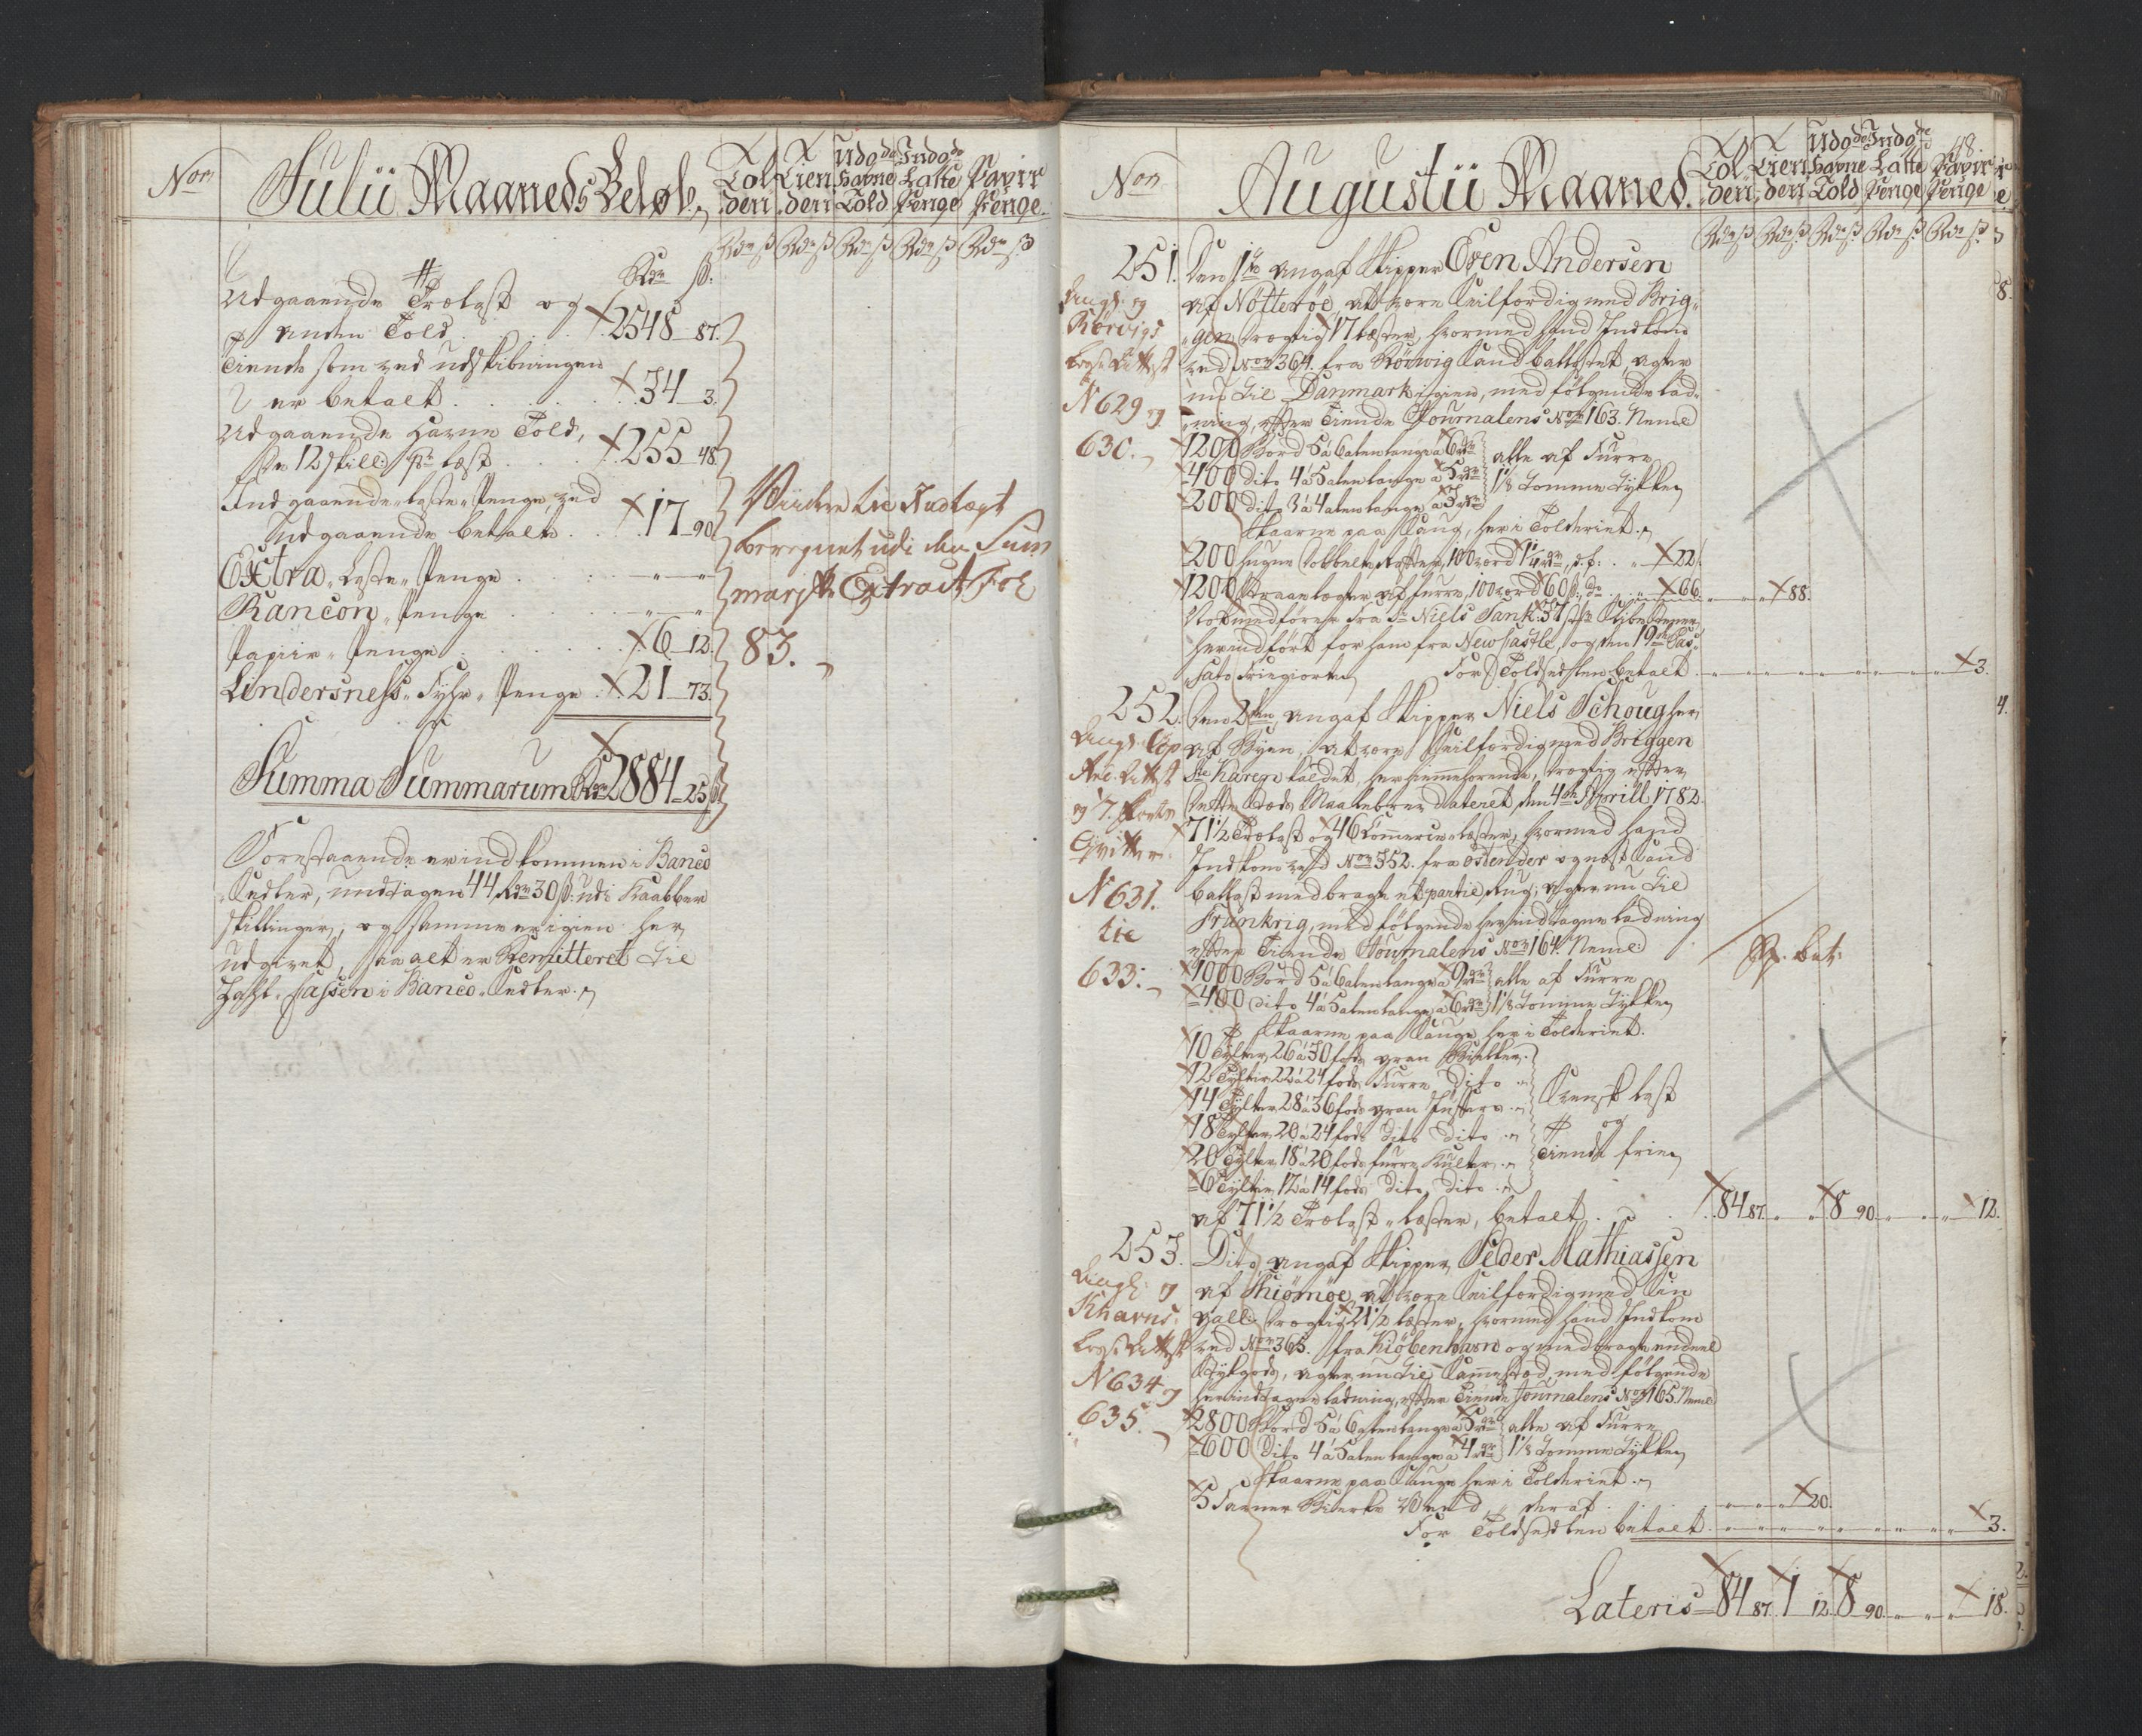 RA, Generaltollkammeret, tollregnskaper, R01/L0131: Tollregnskaper Fredrikshald, 1786, s. 47b-48a